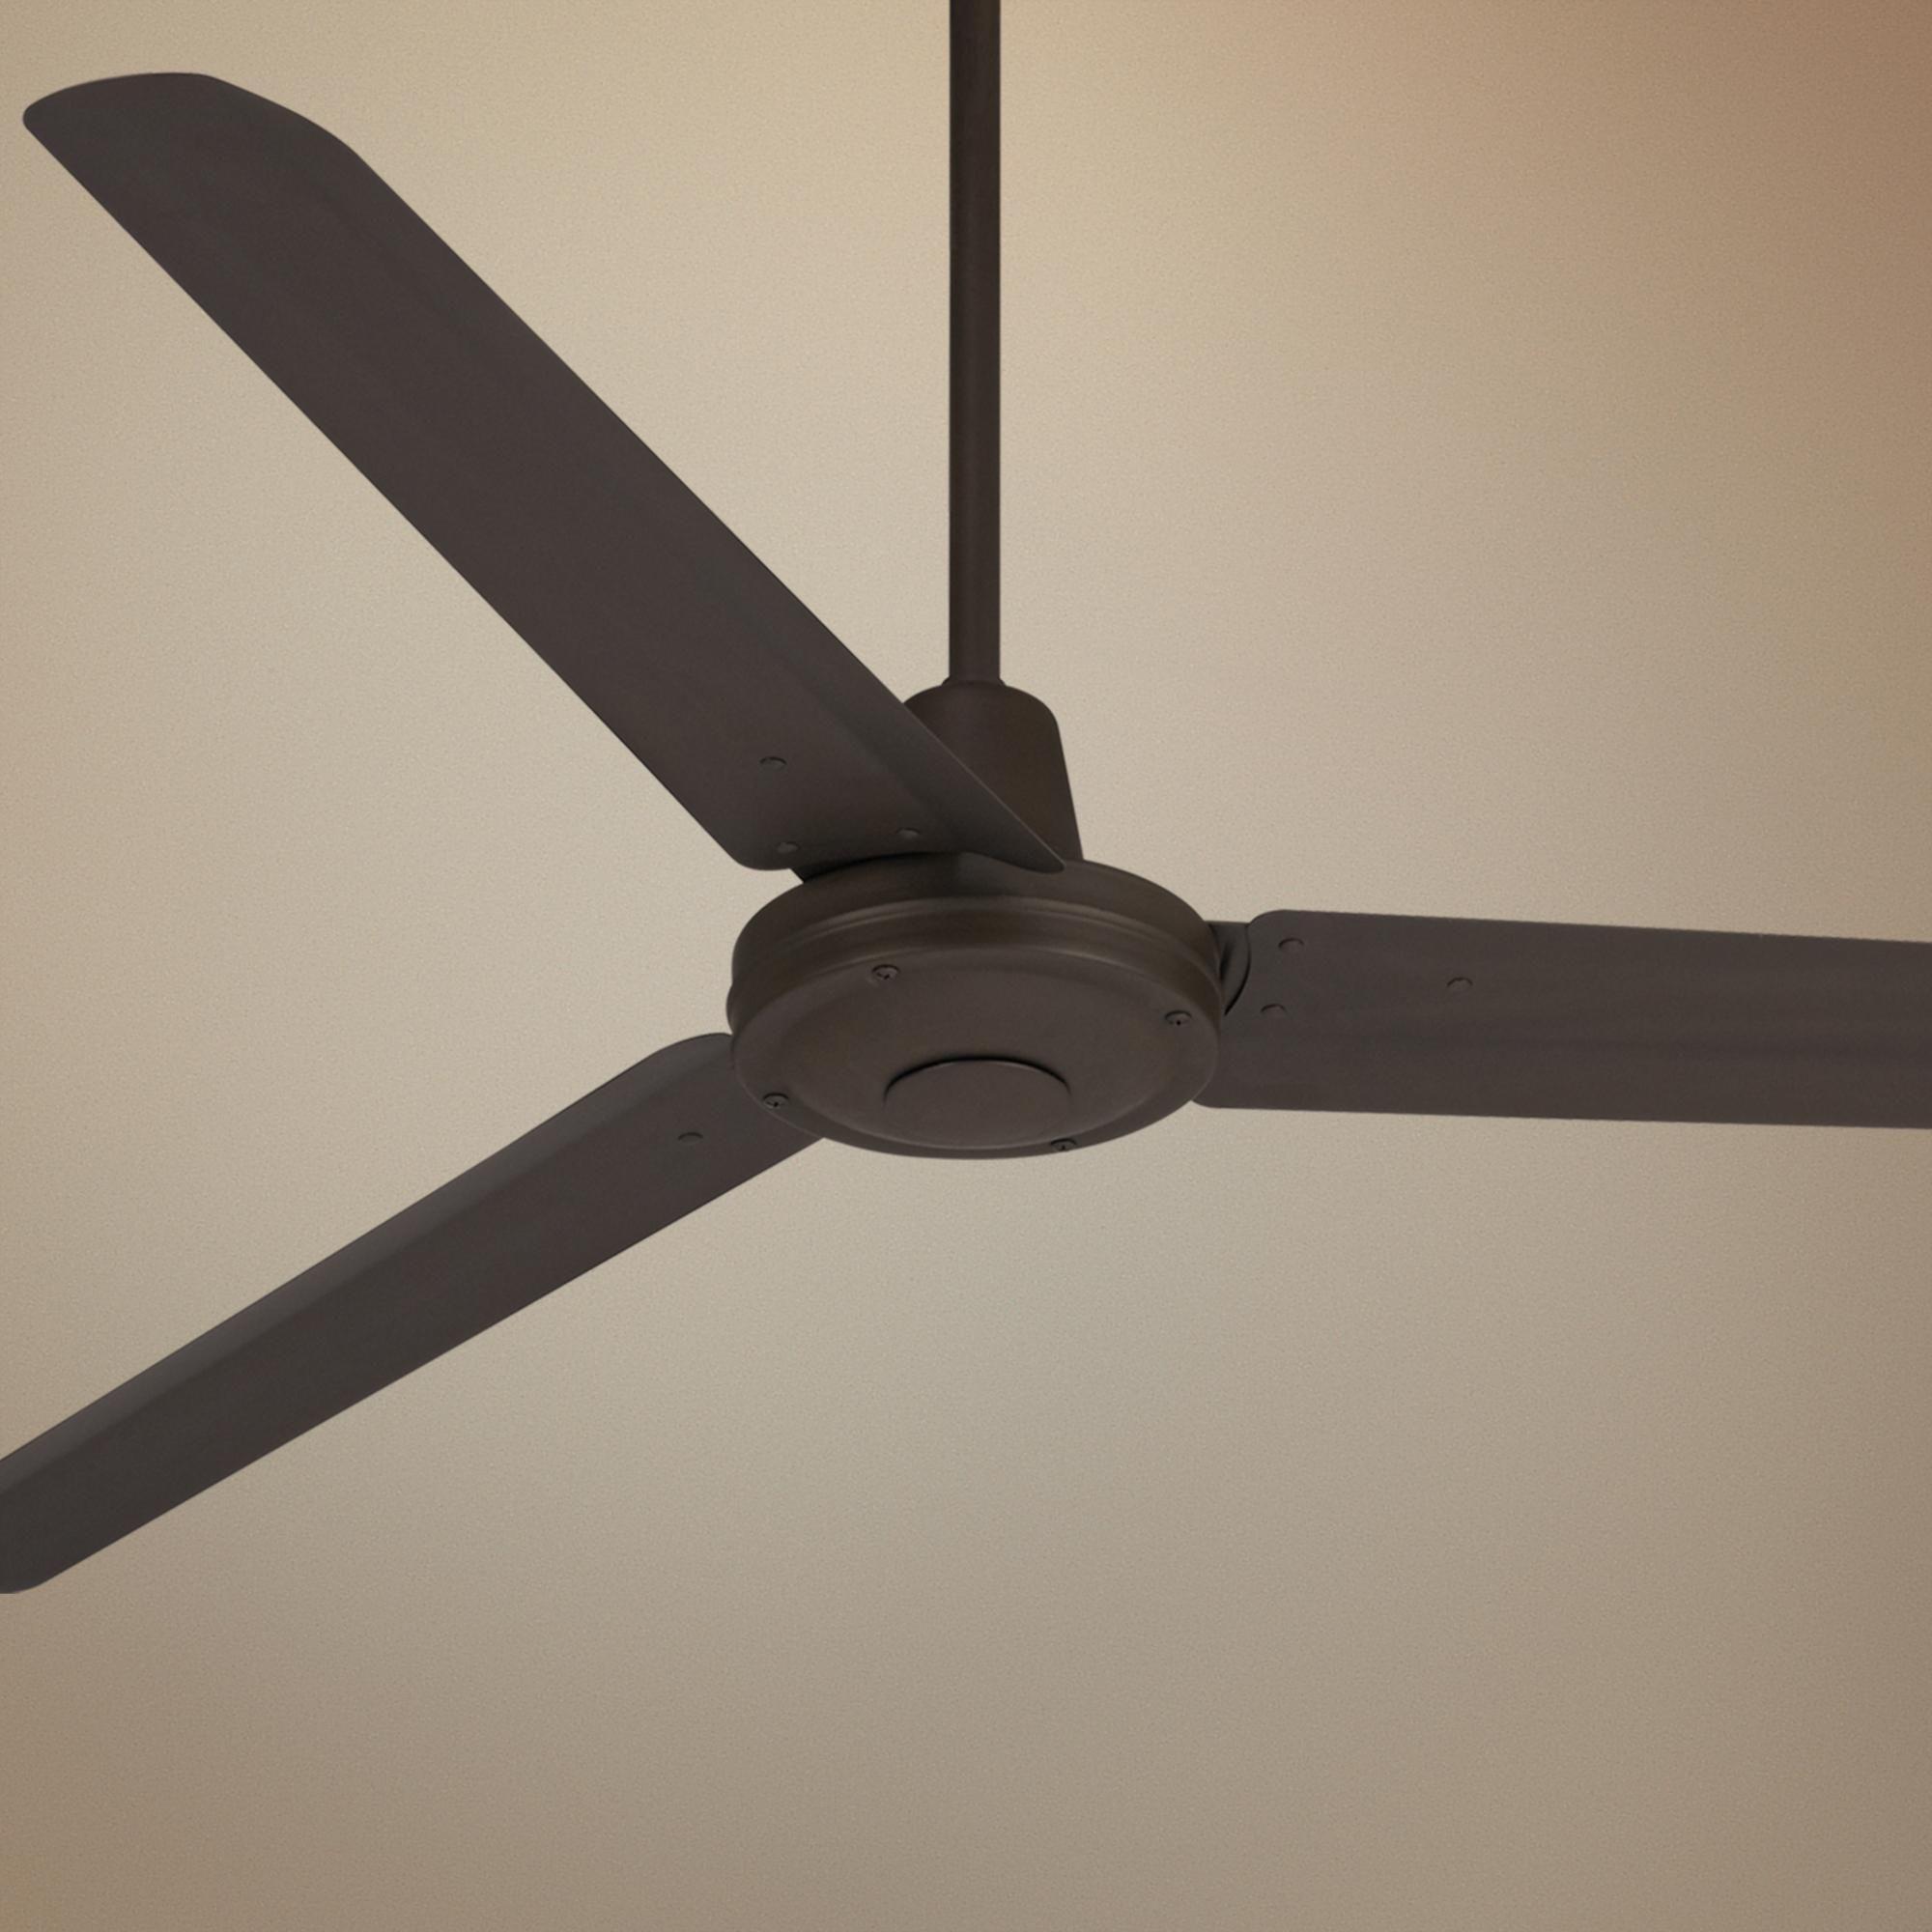 60 Casa Vieja Turbina Dc Damp Bronze Ceiling Fan U4514 Lamps Plus Ceiling Fan Bronze Ceiling Fan Ceiling Fan Light Kit